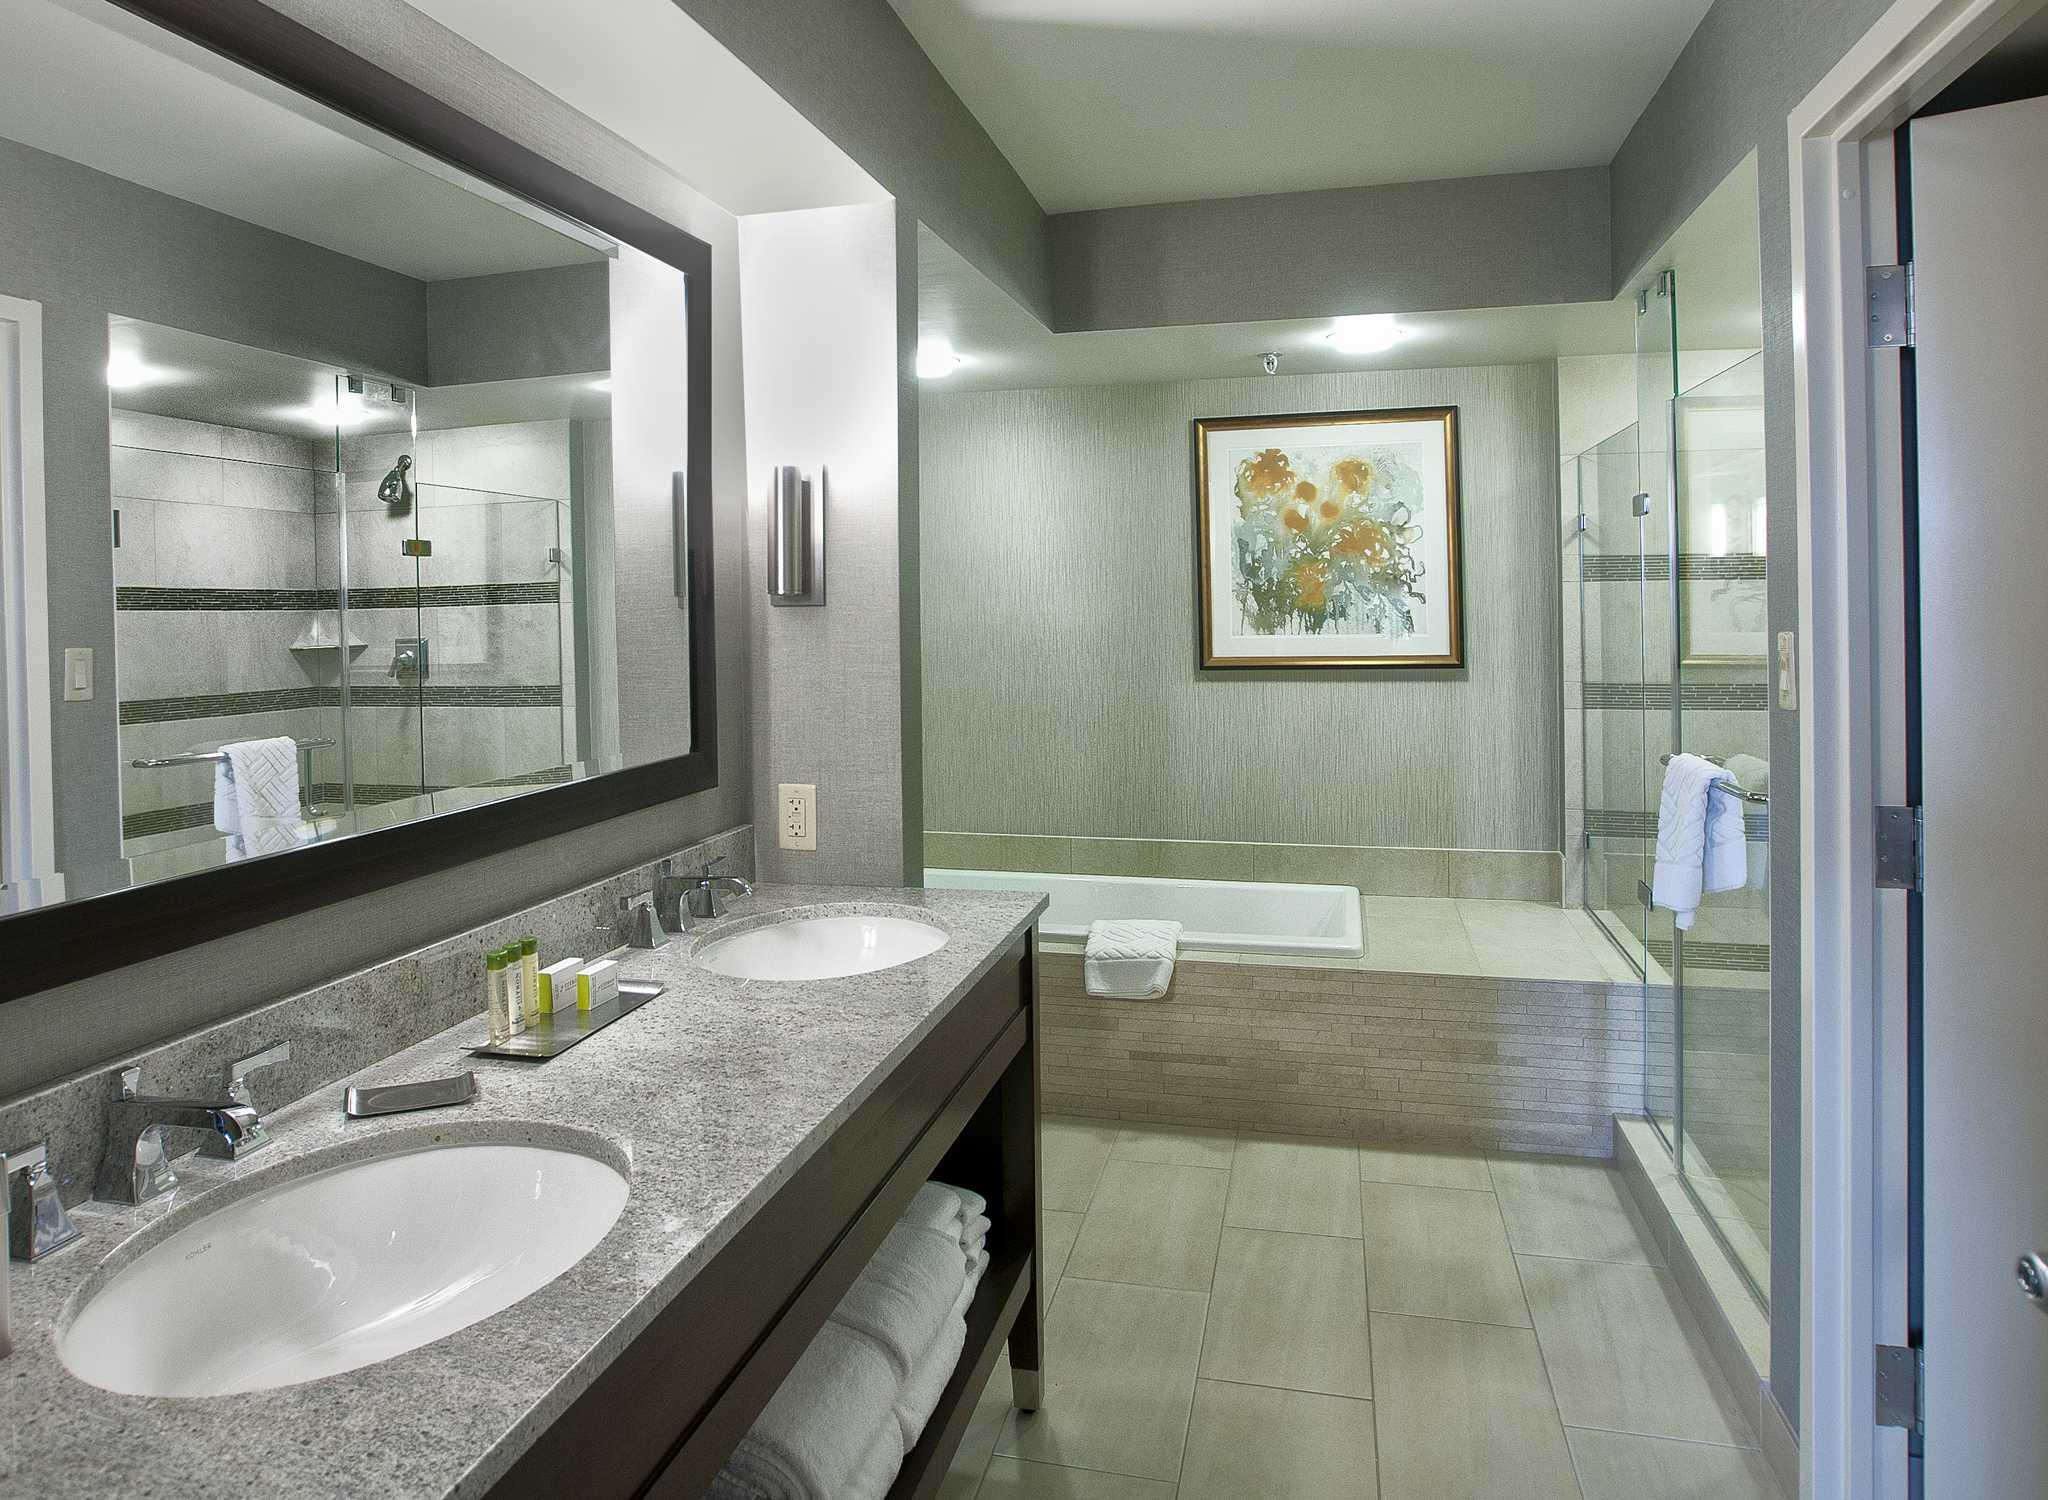 Hauteur Meuble Salle De Bain Vasque A Poser ~ h tel doubletree by hilton hotel washington dc crystal city virginie